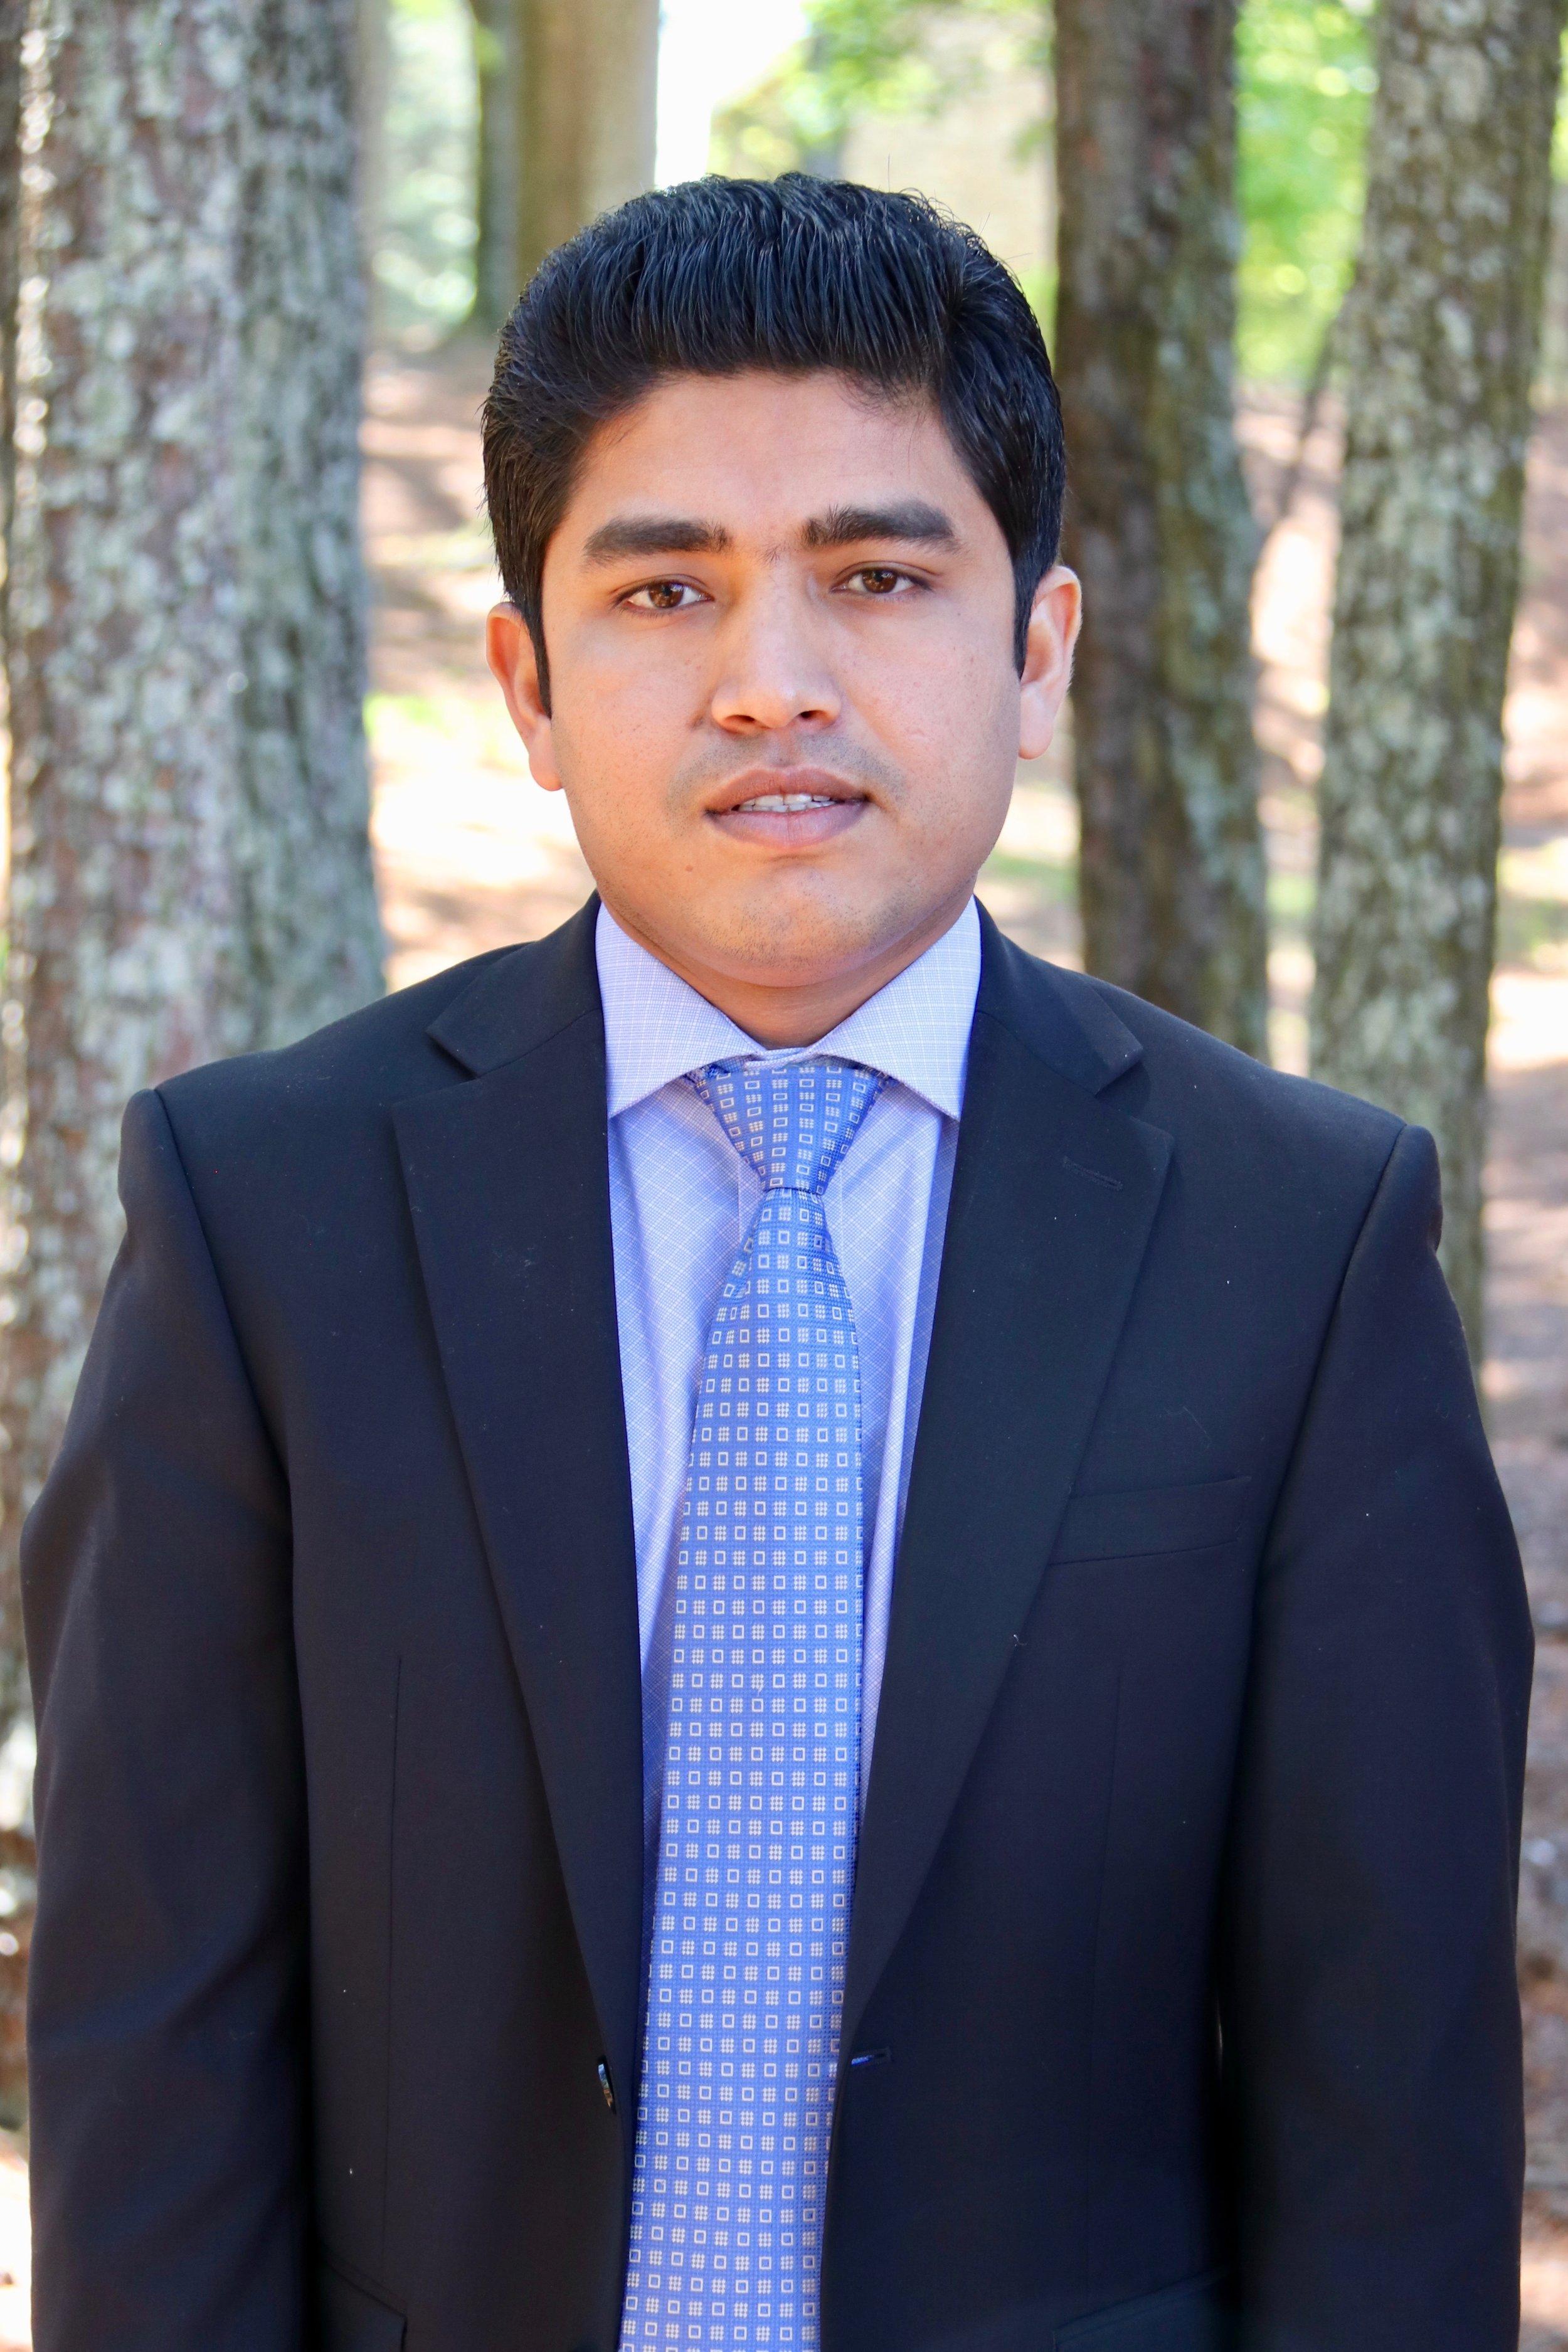 Ahsan Ullah - Deputy Secretary(404) 396-7719Serving the (BRCG) organization since January 2018.